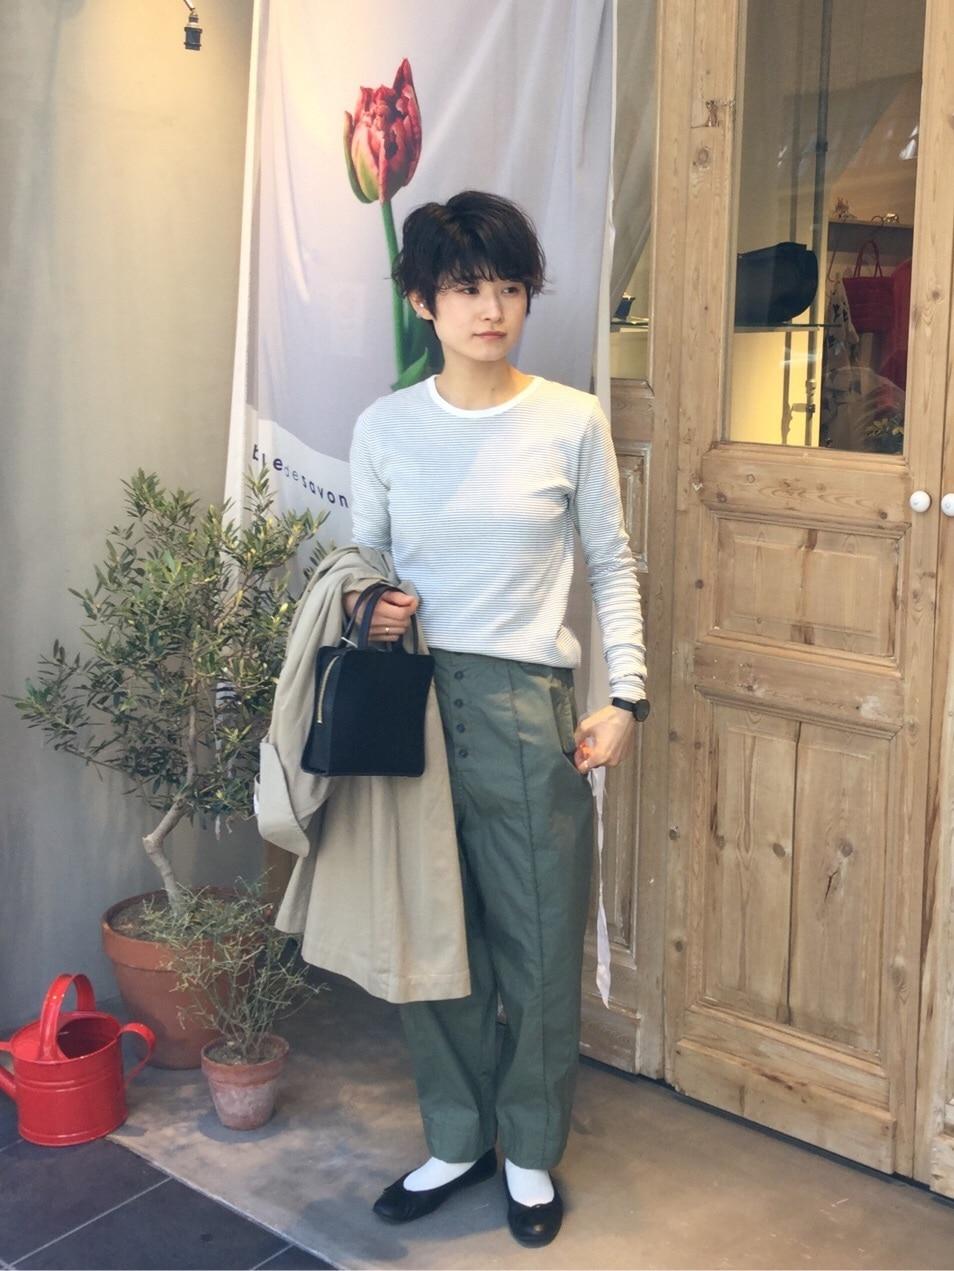 yuni / bulle de savon 京都路面 身長:158cm 2020.03.27